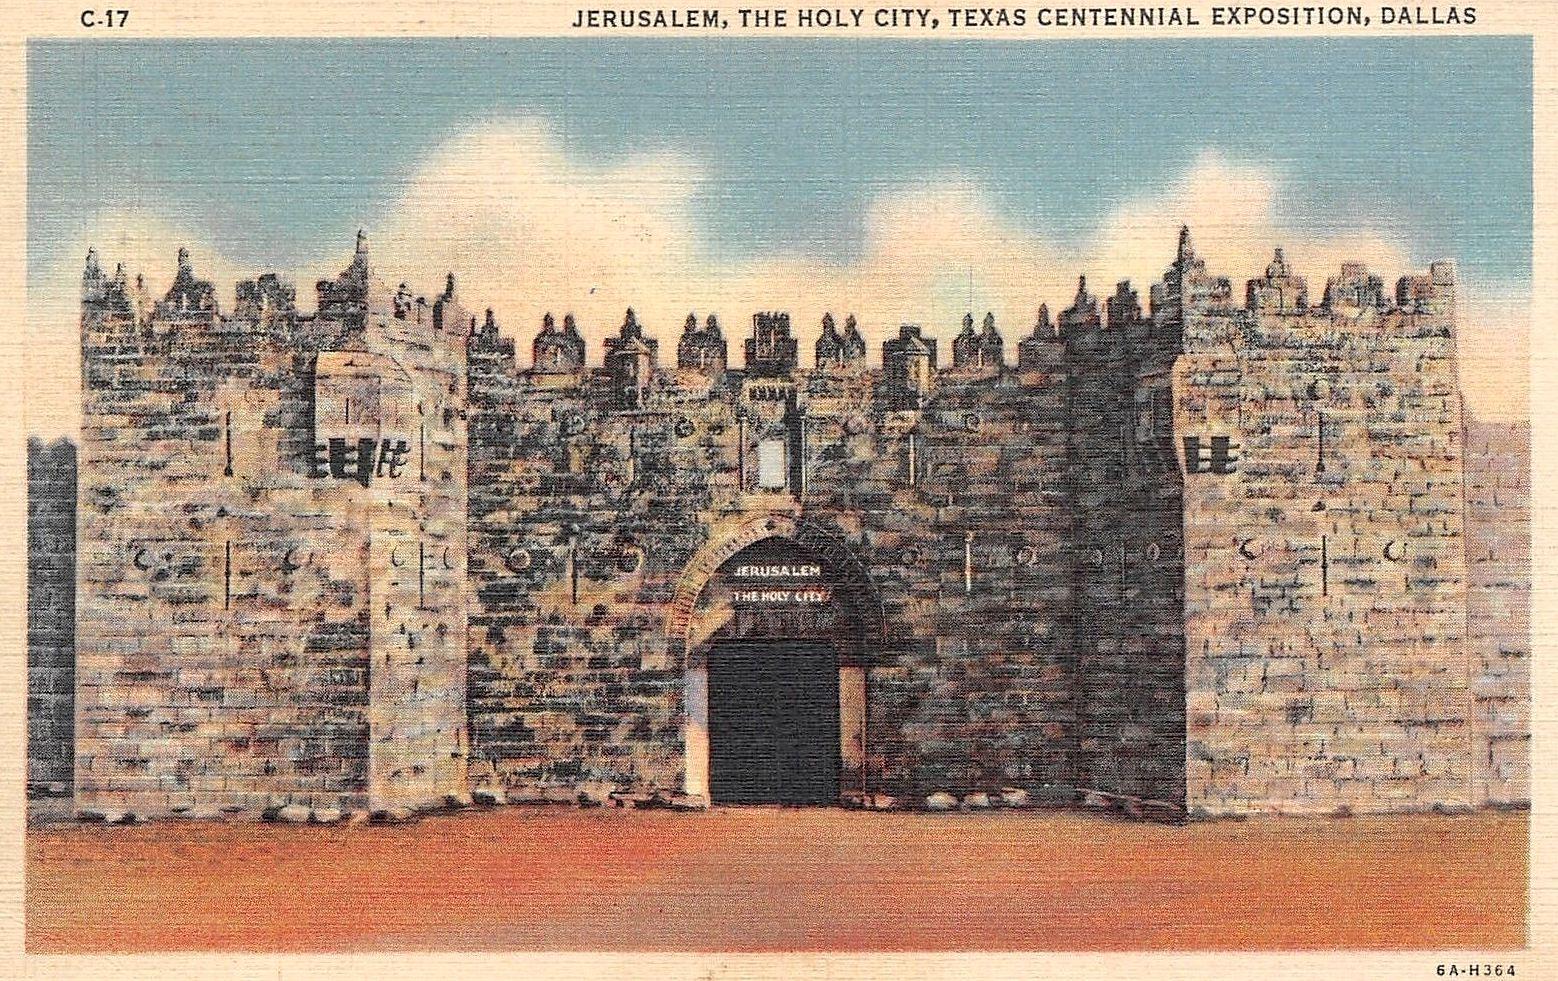 tx-centennial_jerusalem-the-holy-city_postcard